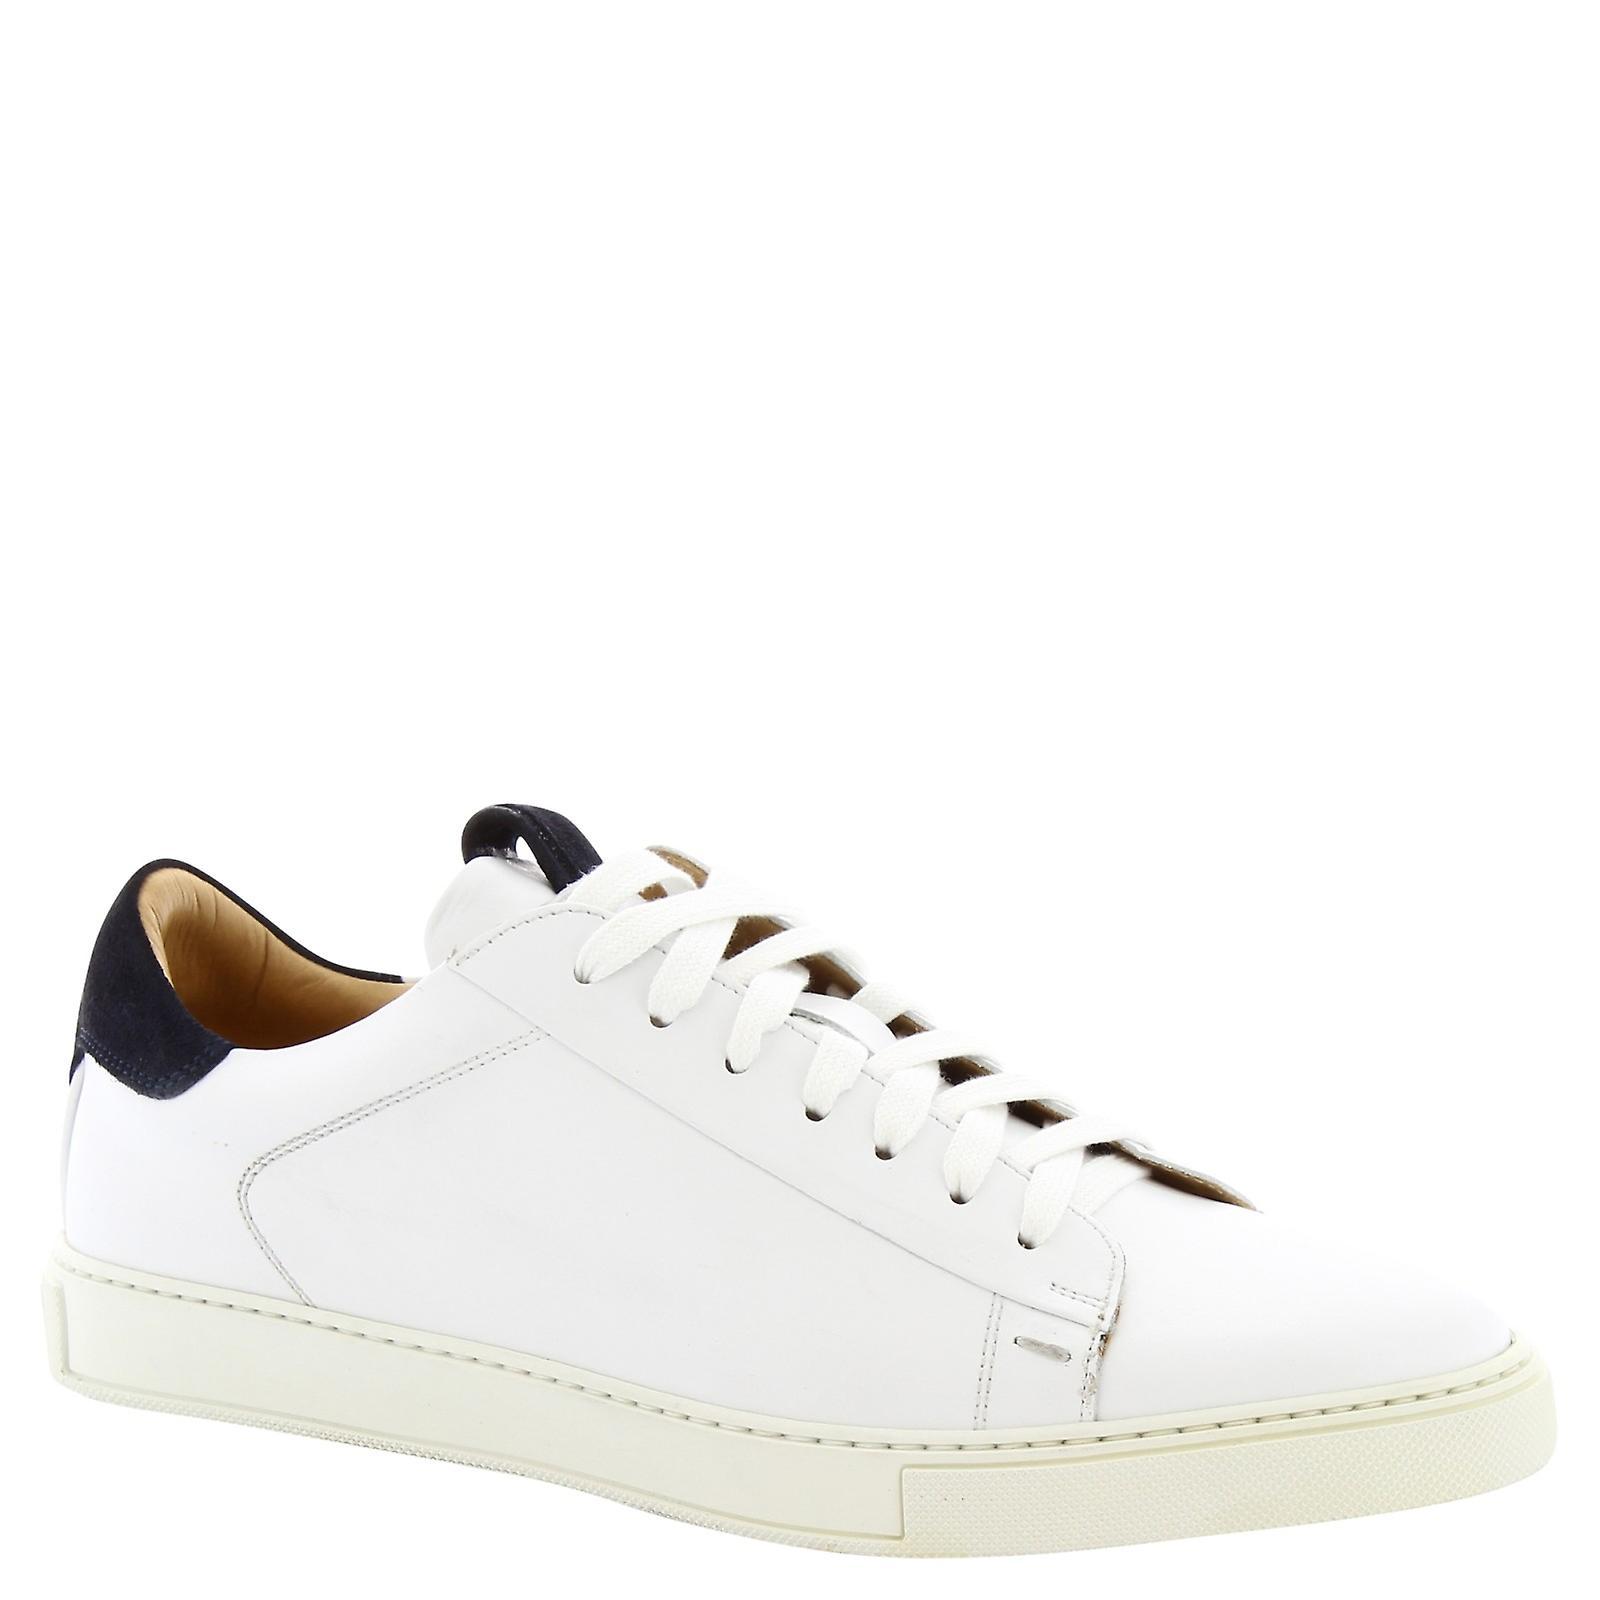 Leonardo Shoes 7729tomfranchbianco Men-apos;s White Leather Sneakers - Remise particulière